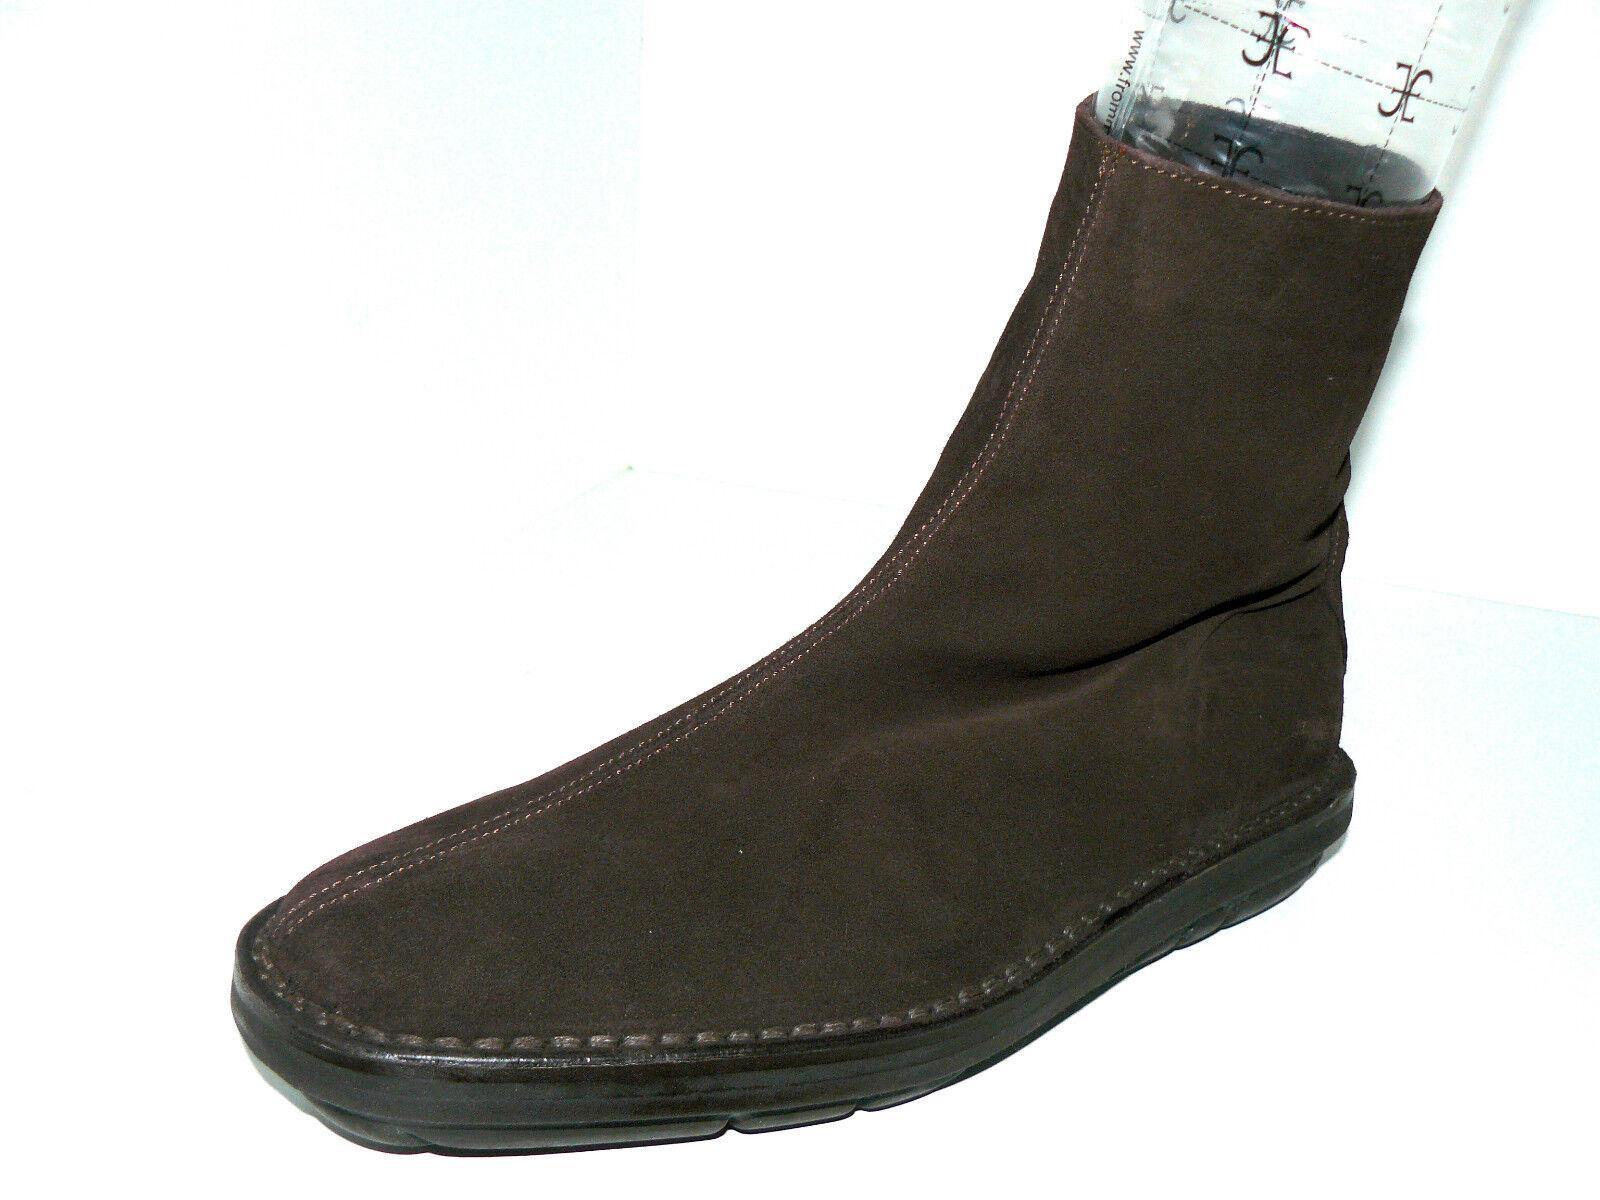 BALLY Damen dunkelbraune Wildleder Stiefel Stiefeletten 40 UK 6,5 Lammfell Damen BALLY NEU 93933f